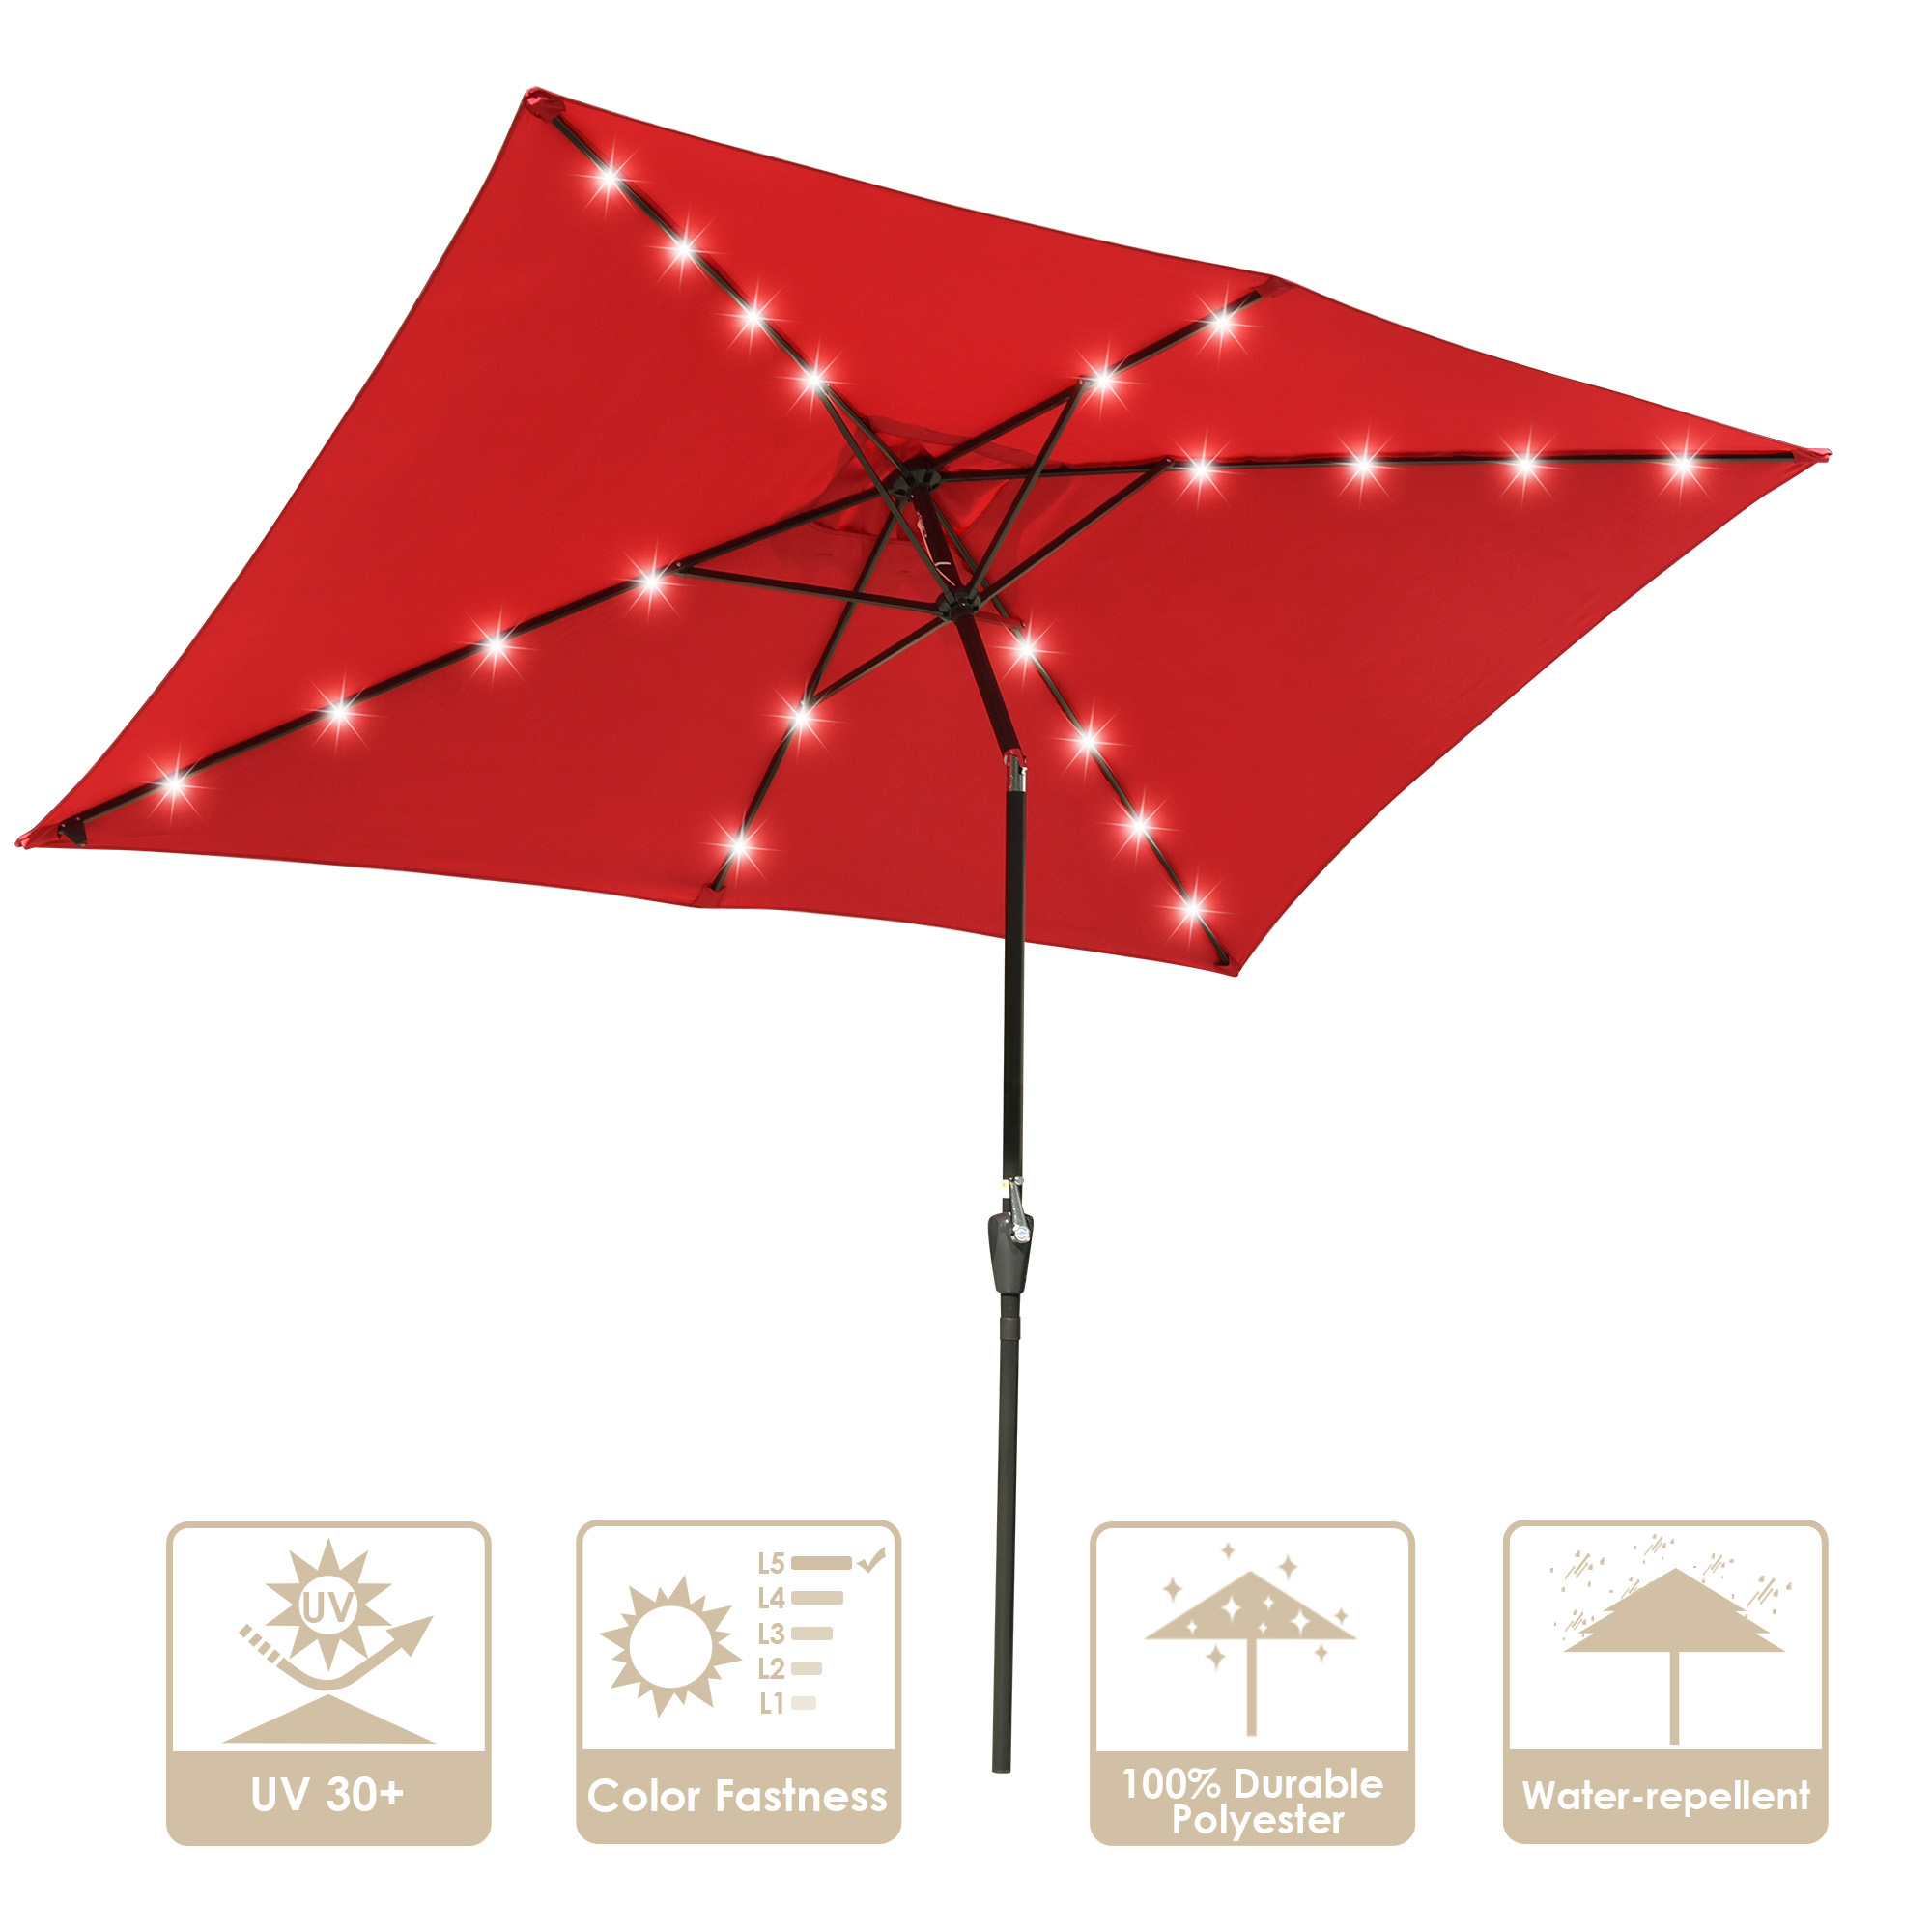 10x6 5ft rectangle outdoor patio beach market aluminium umbrella w sun shade solar powered led light crank tilt